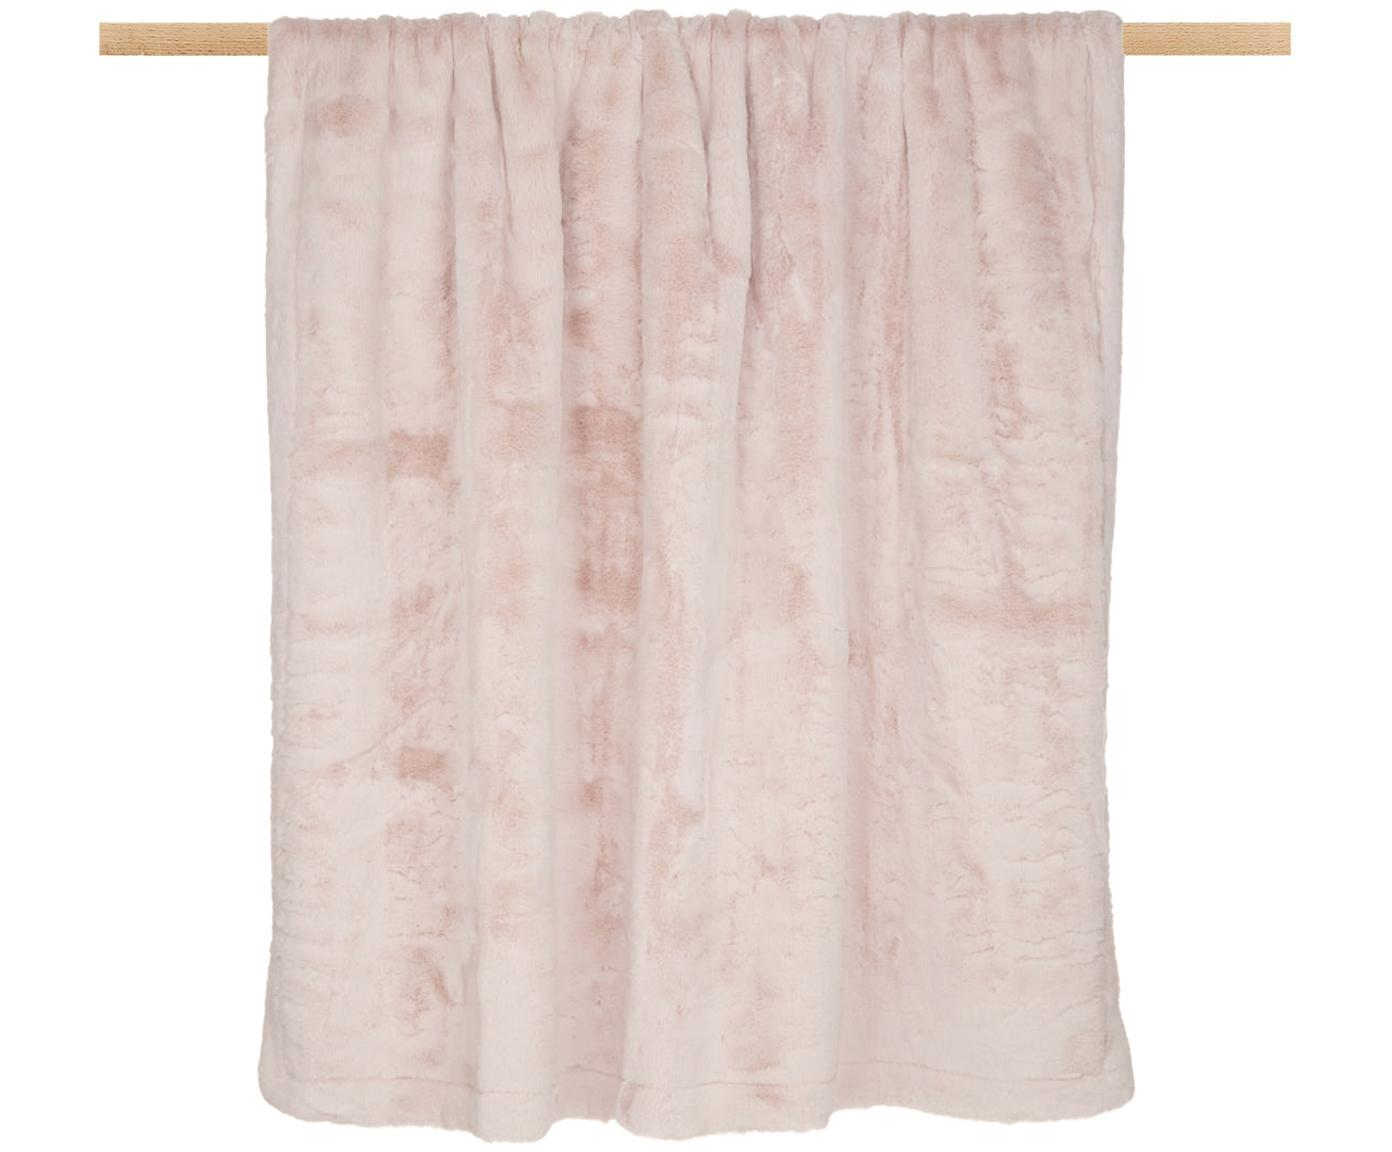 Kunstfell-Plaid Mette, glatt, Vorderseite: 100% Polyester, Rückseite: 100% Polyester, Rosa, 150 x 200 cm